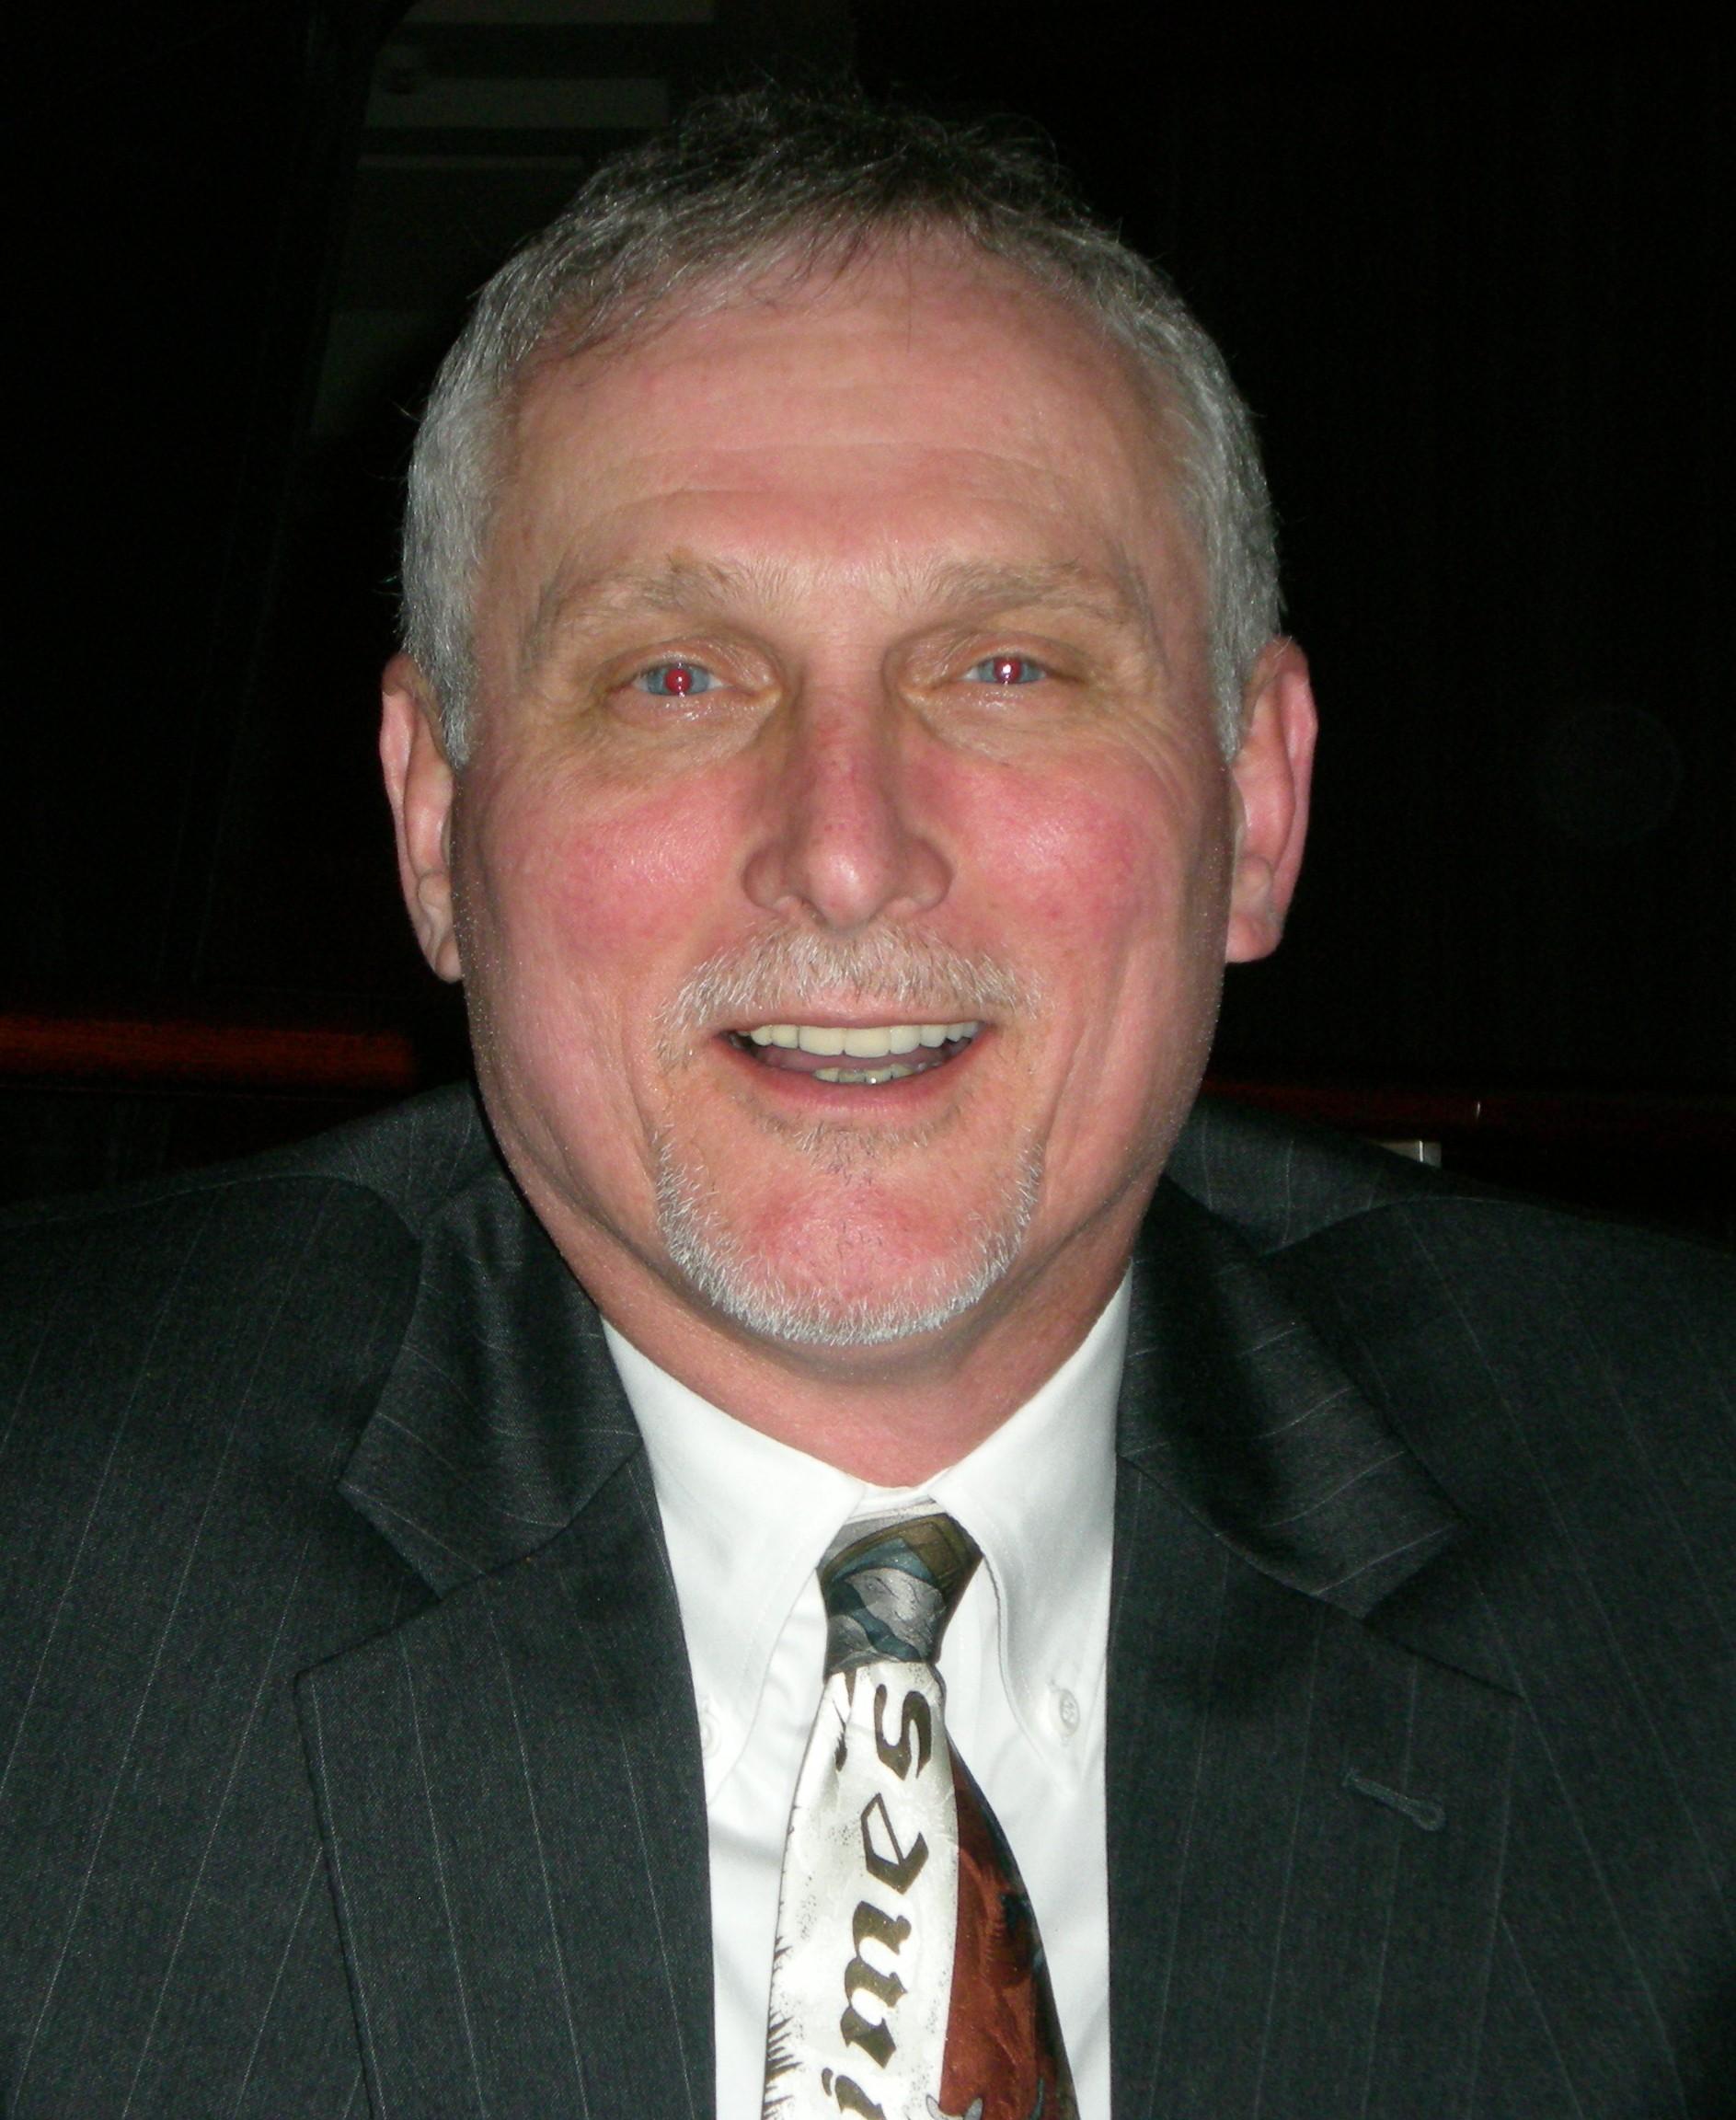 Frank Johnson